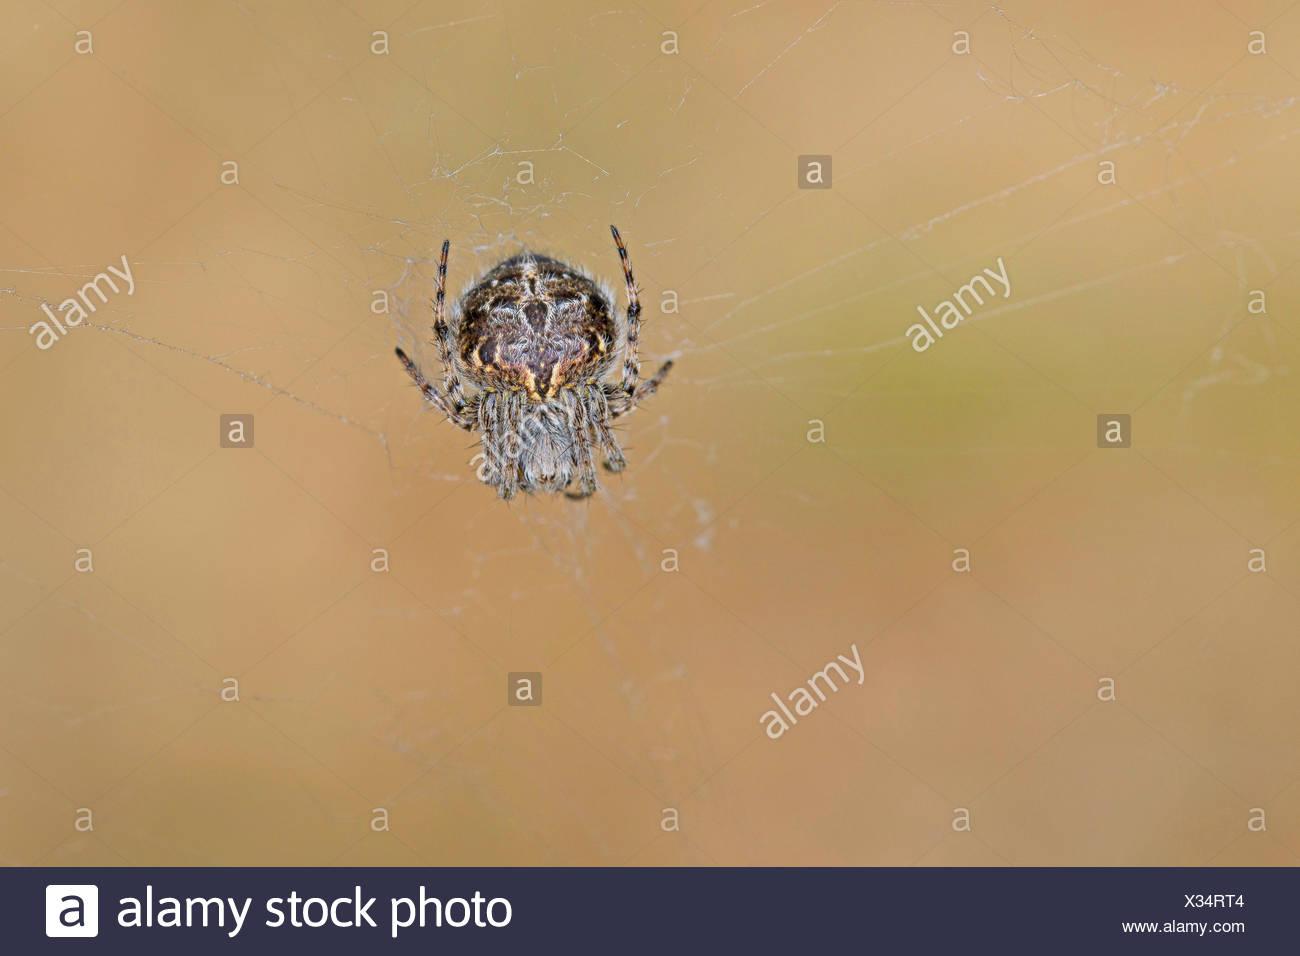 bush orbweaver, basketweaver (Araneus redii, Agalenatea redii), in its web, Germany - Stock Image